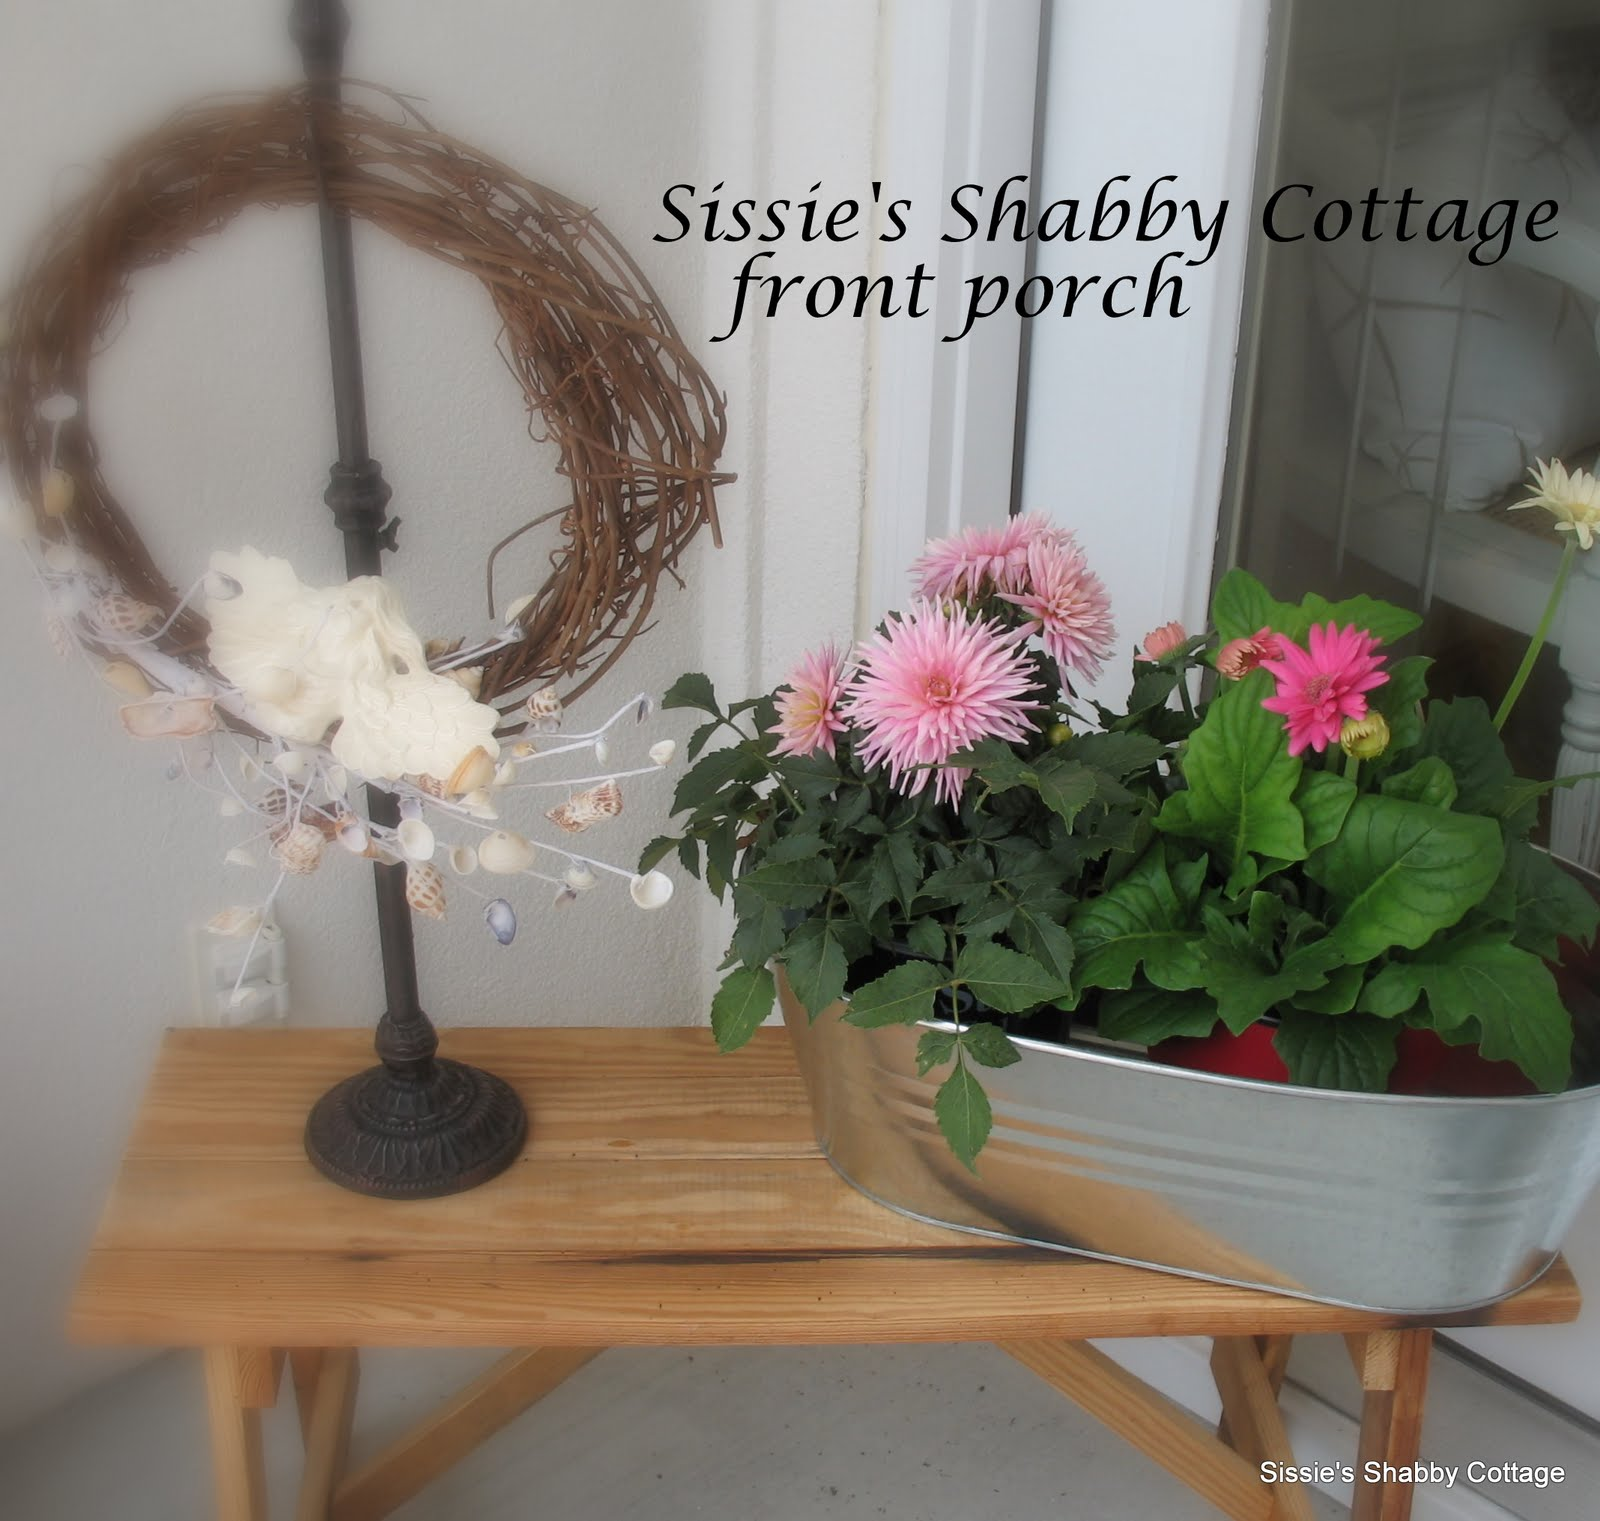 http://1.bp.blogspot.com/_Q3DE251yZ64/TAlUm2HalBI/AAAAAAAADEg/HJGvZvvUWO4/s1600/sissie%27s+shabby+cottage+013.JPG